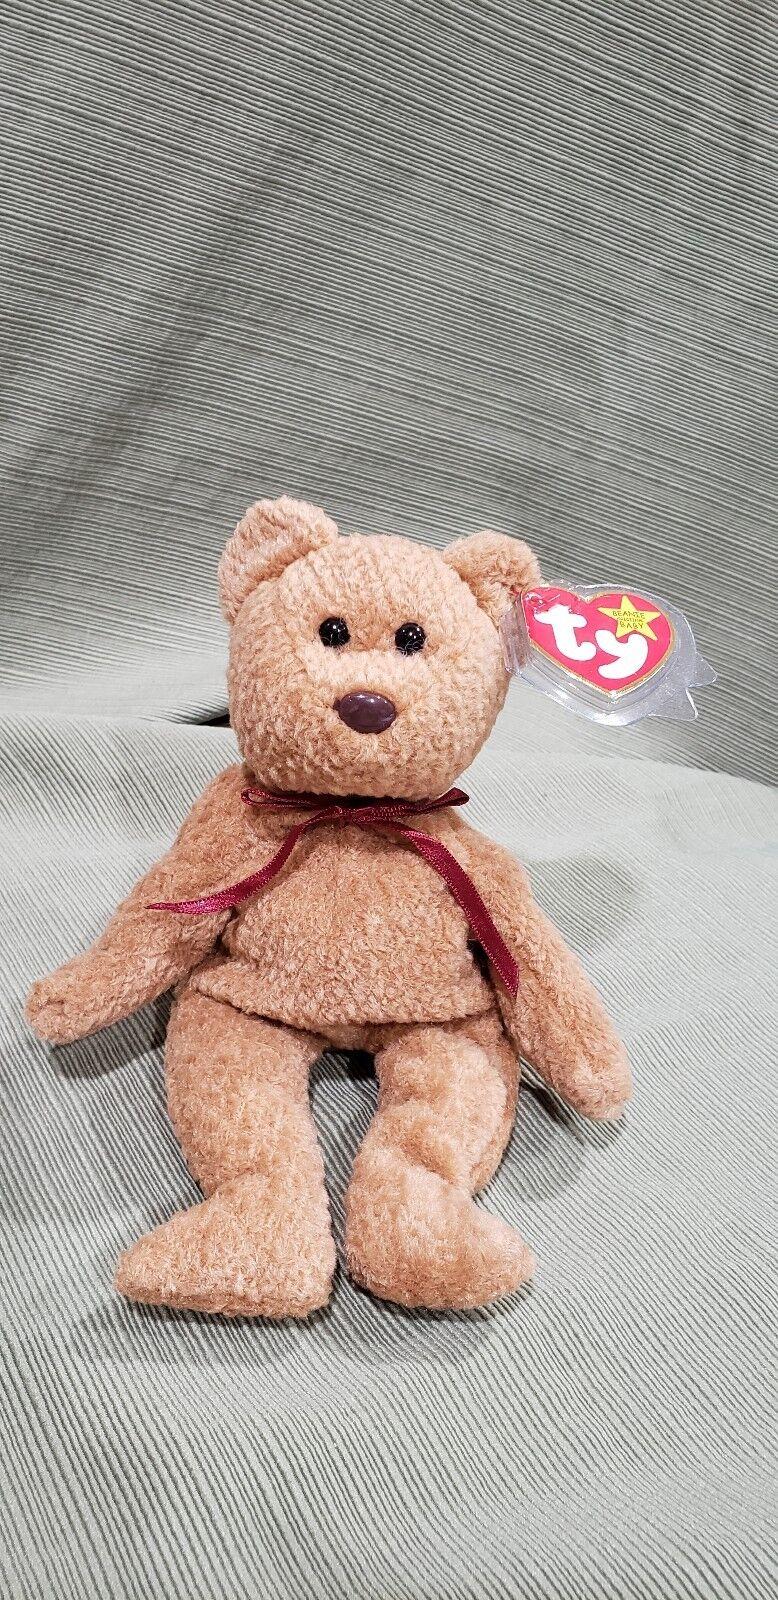 Ty Beanie Baby Curly the Bear w Many Errors 1993 MWMT